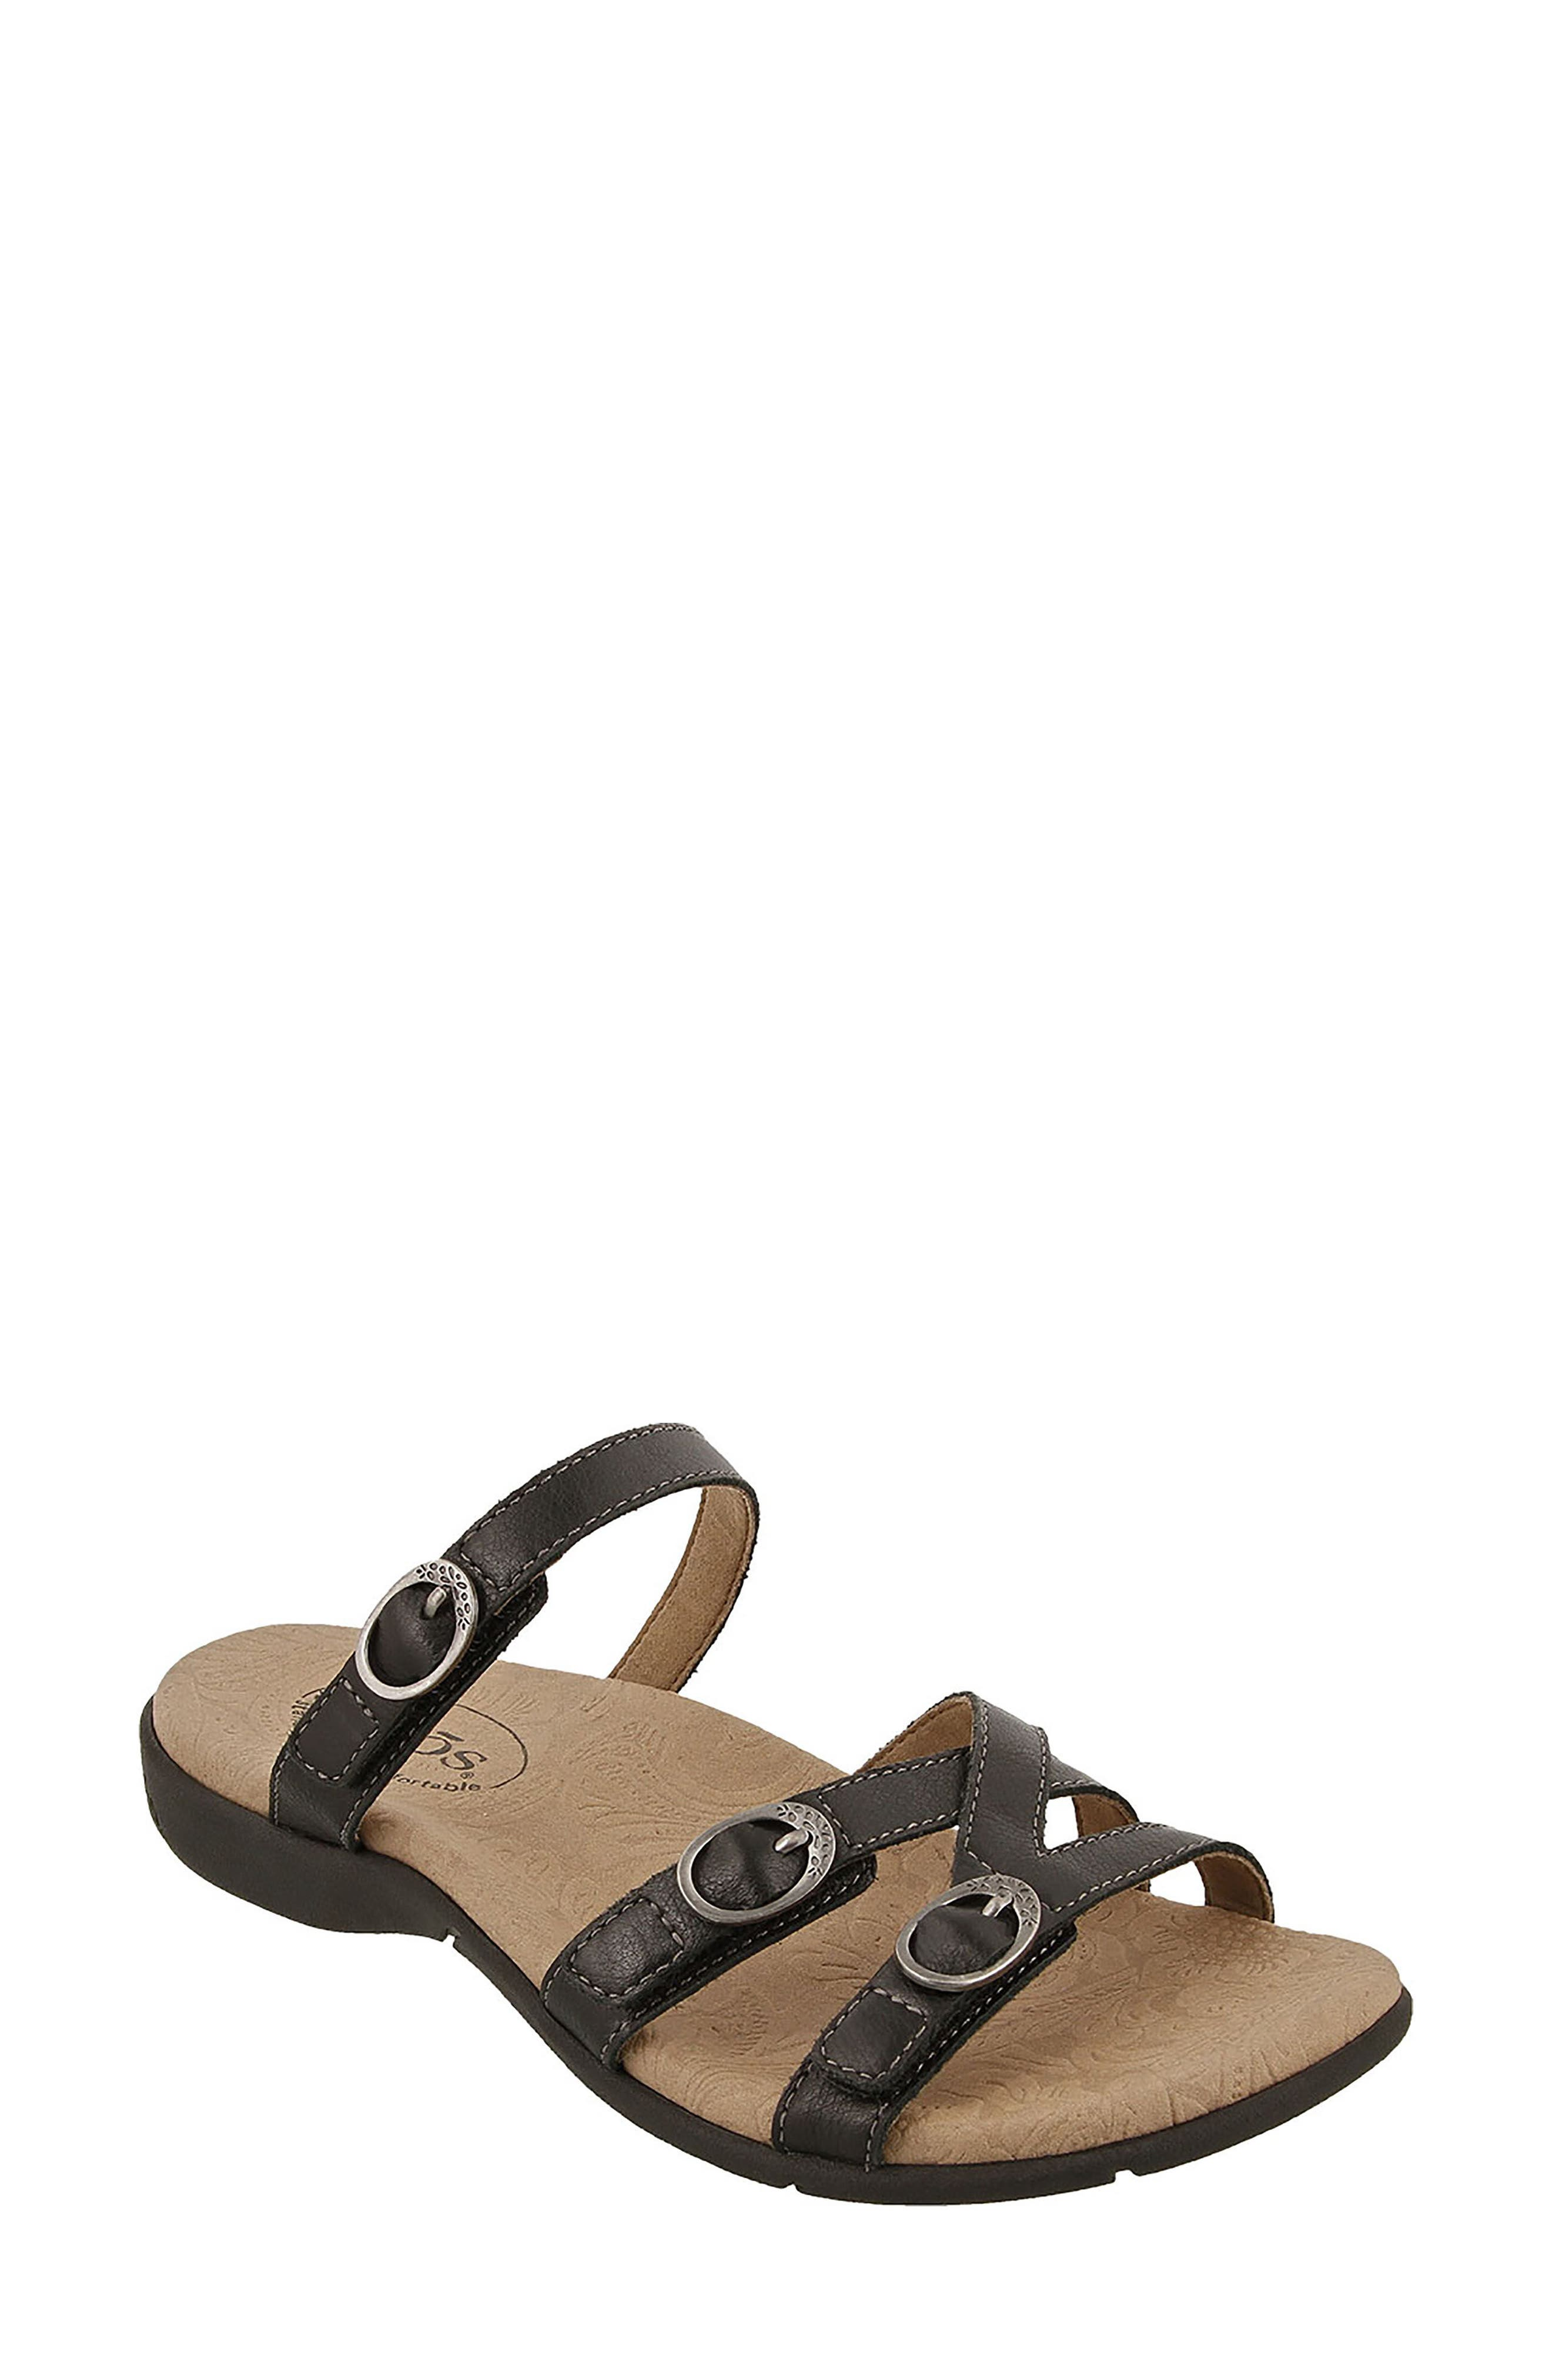 Captive Sandal,                         Main,                         color, BLACK LEATHER